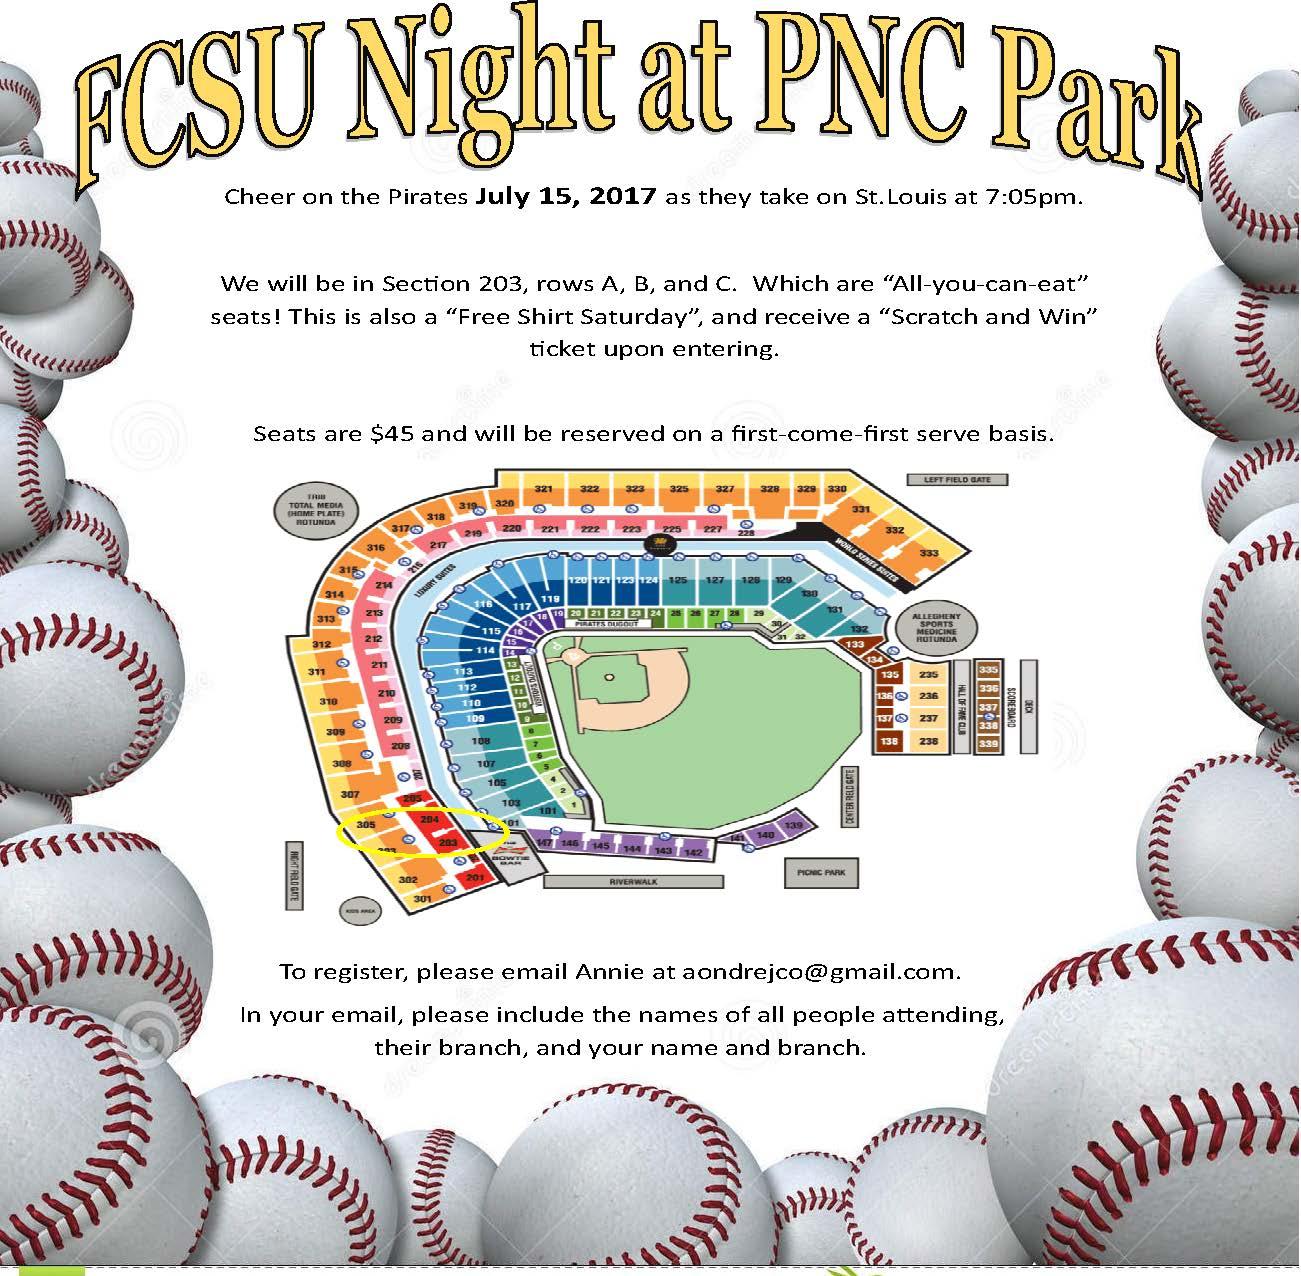 FCSU Night at PNC